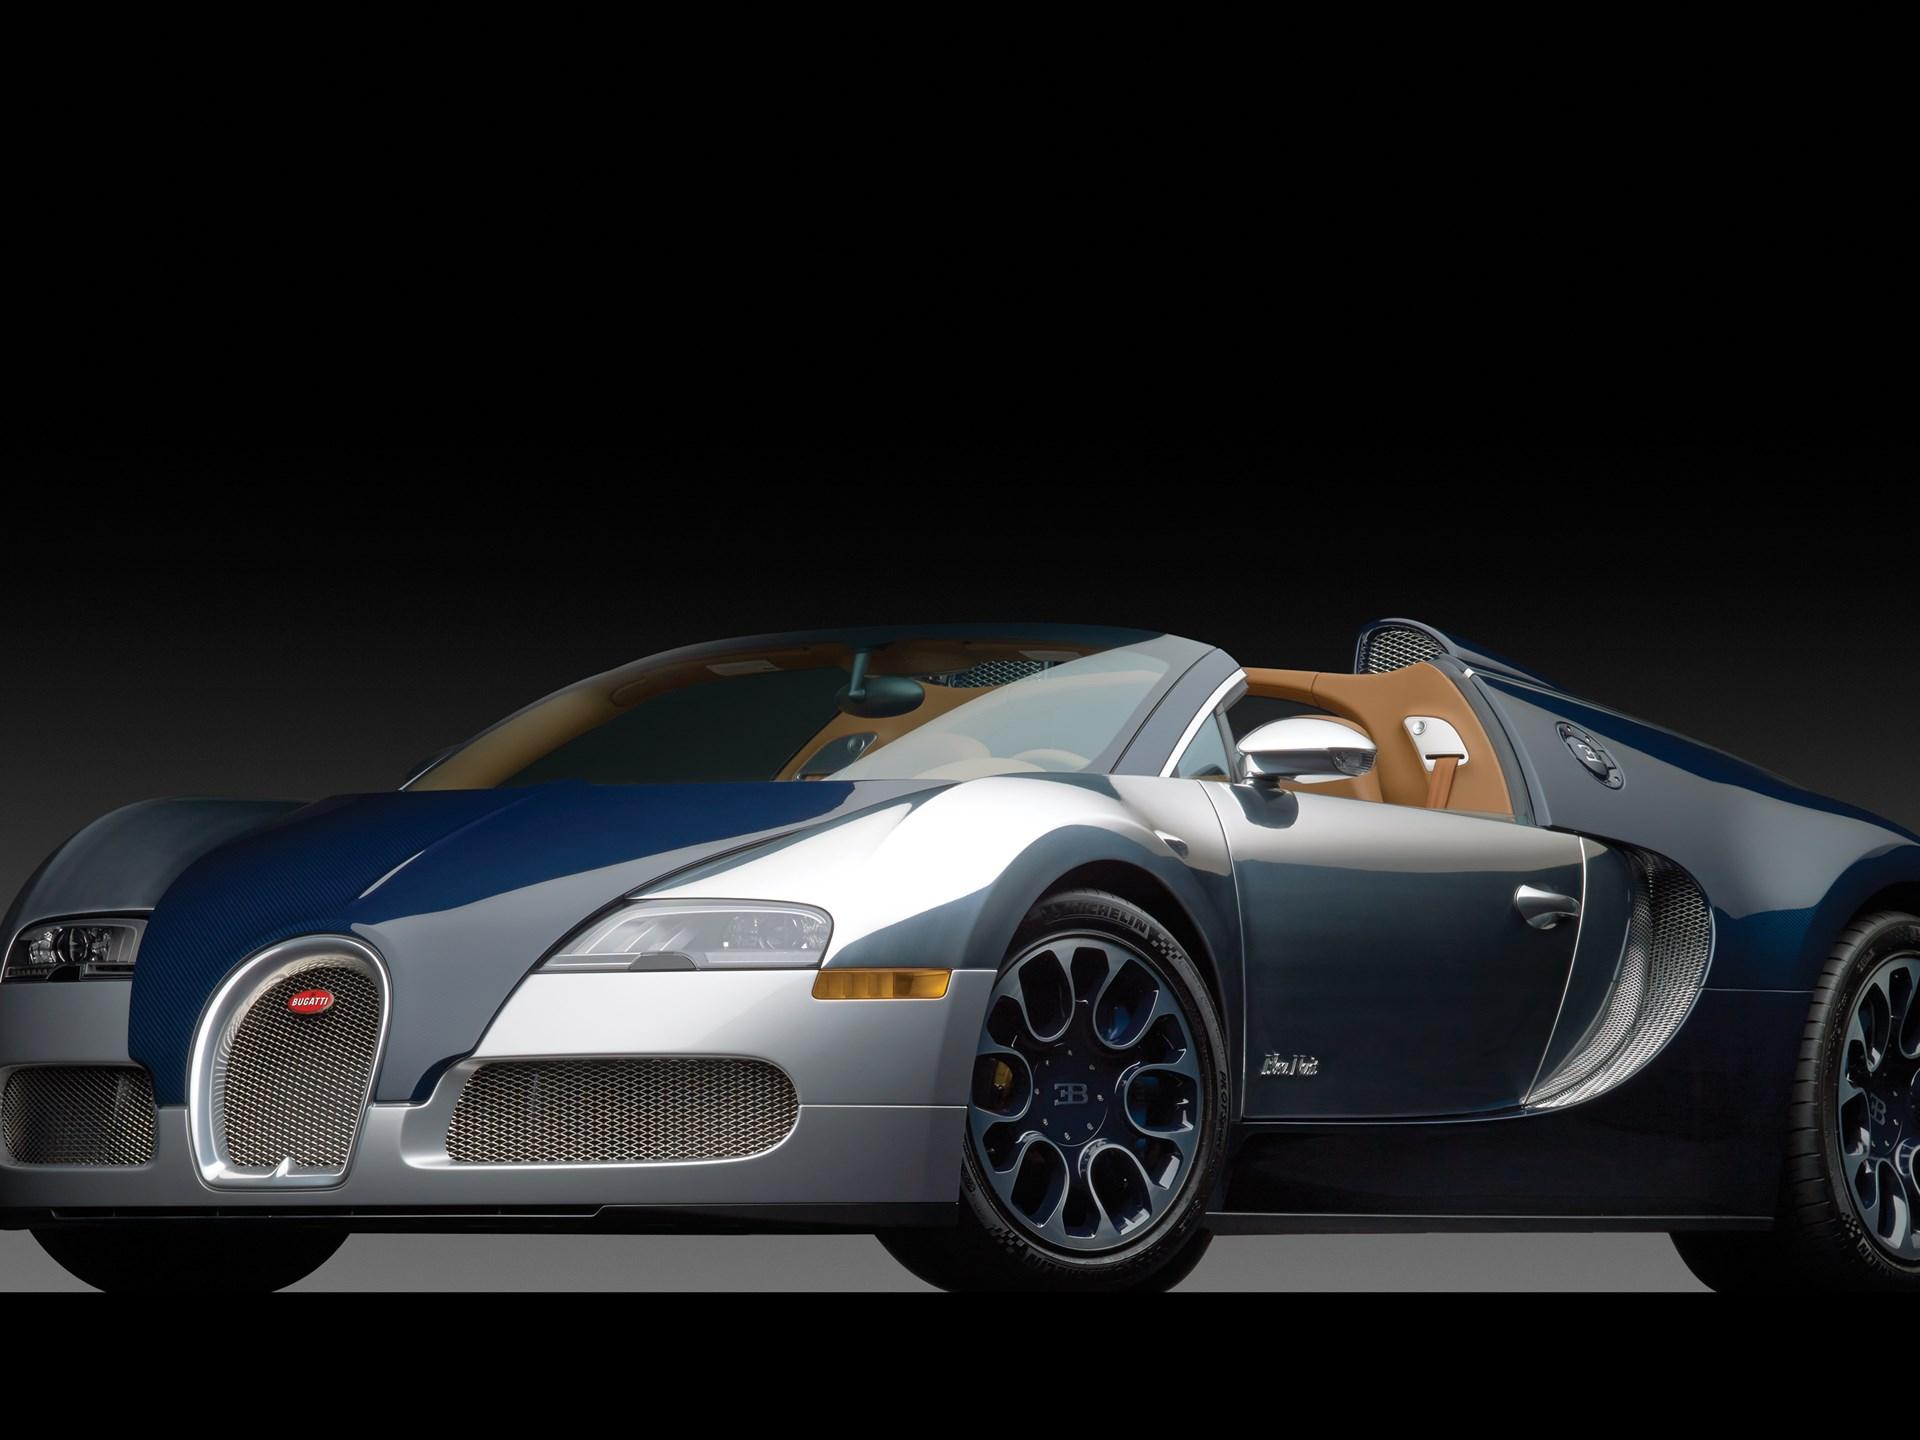 rm sotheby's - 2011 bugatti veyron 16.4 grand sport bleu nuit | new